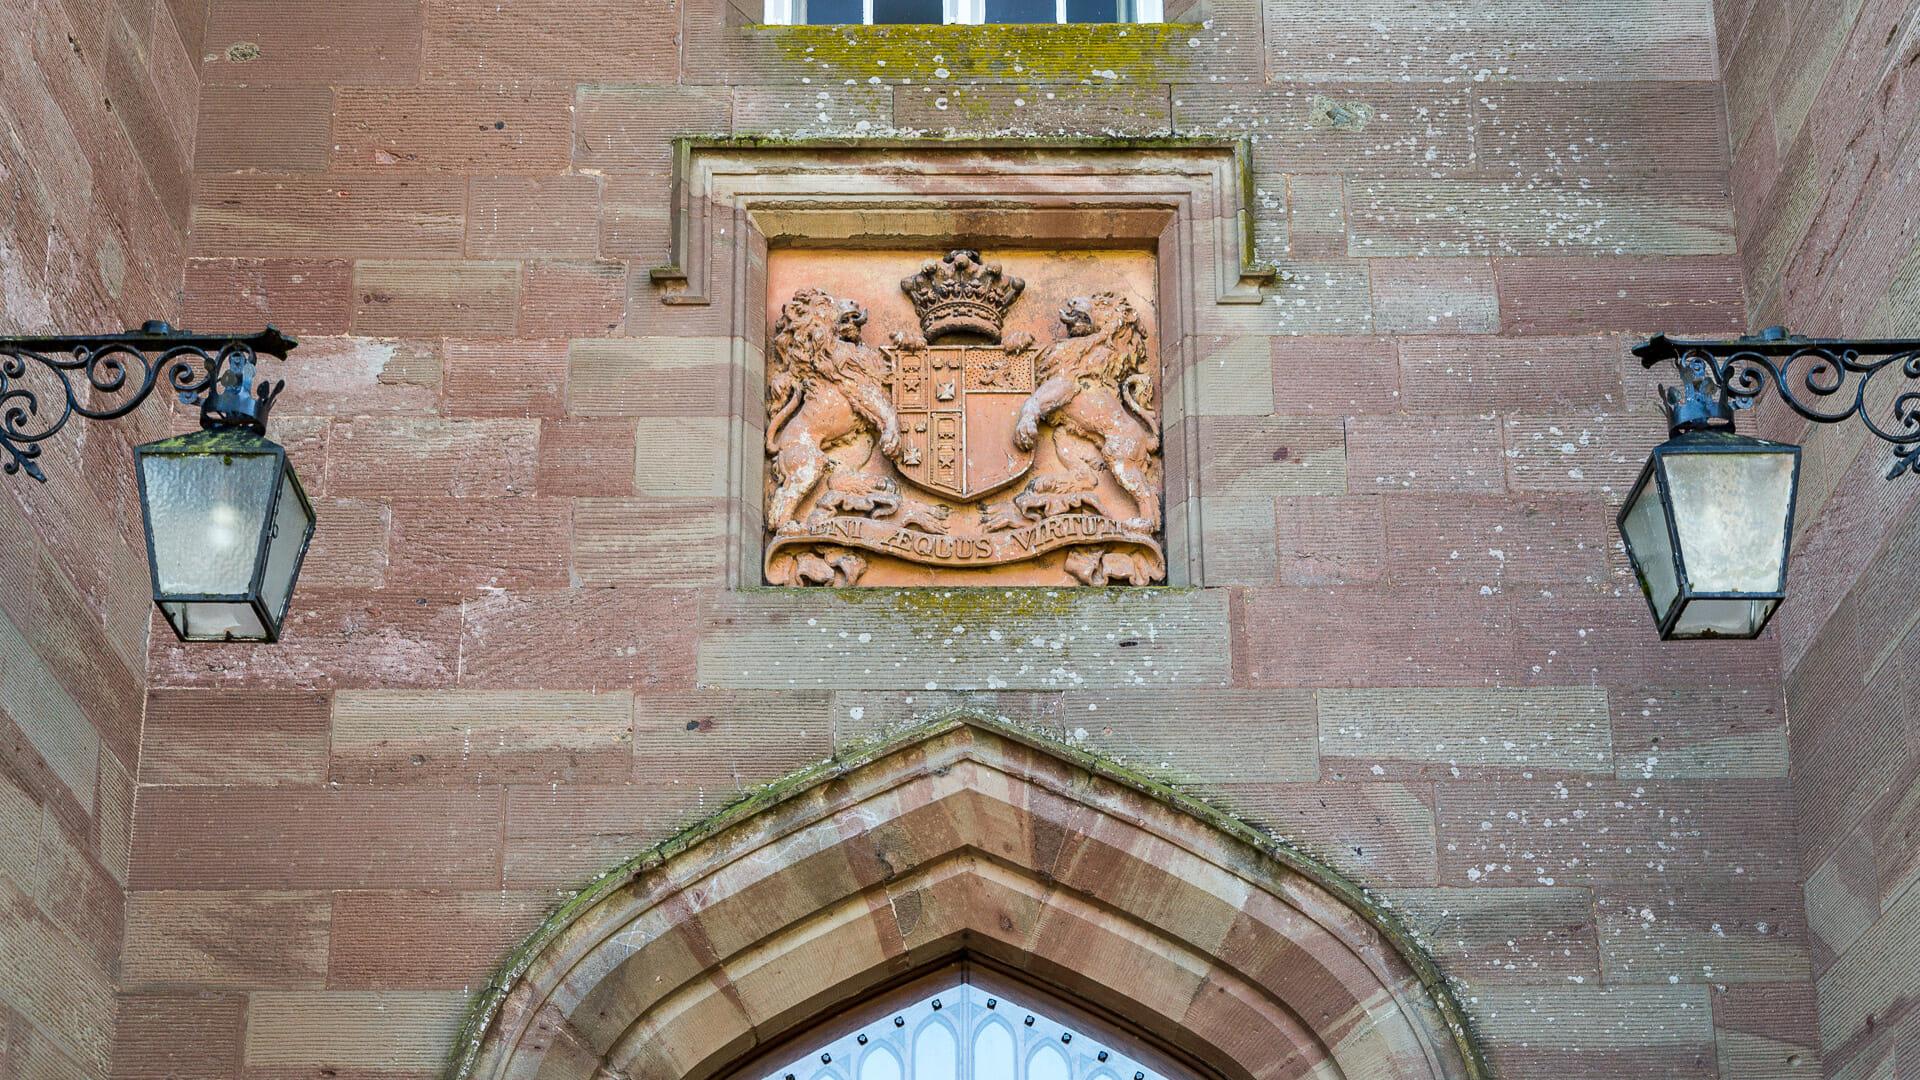 Wappen über dem Eingang